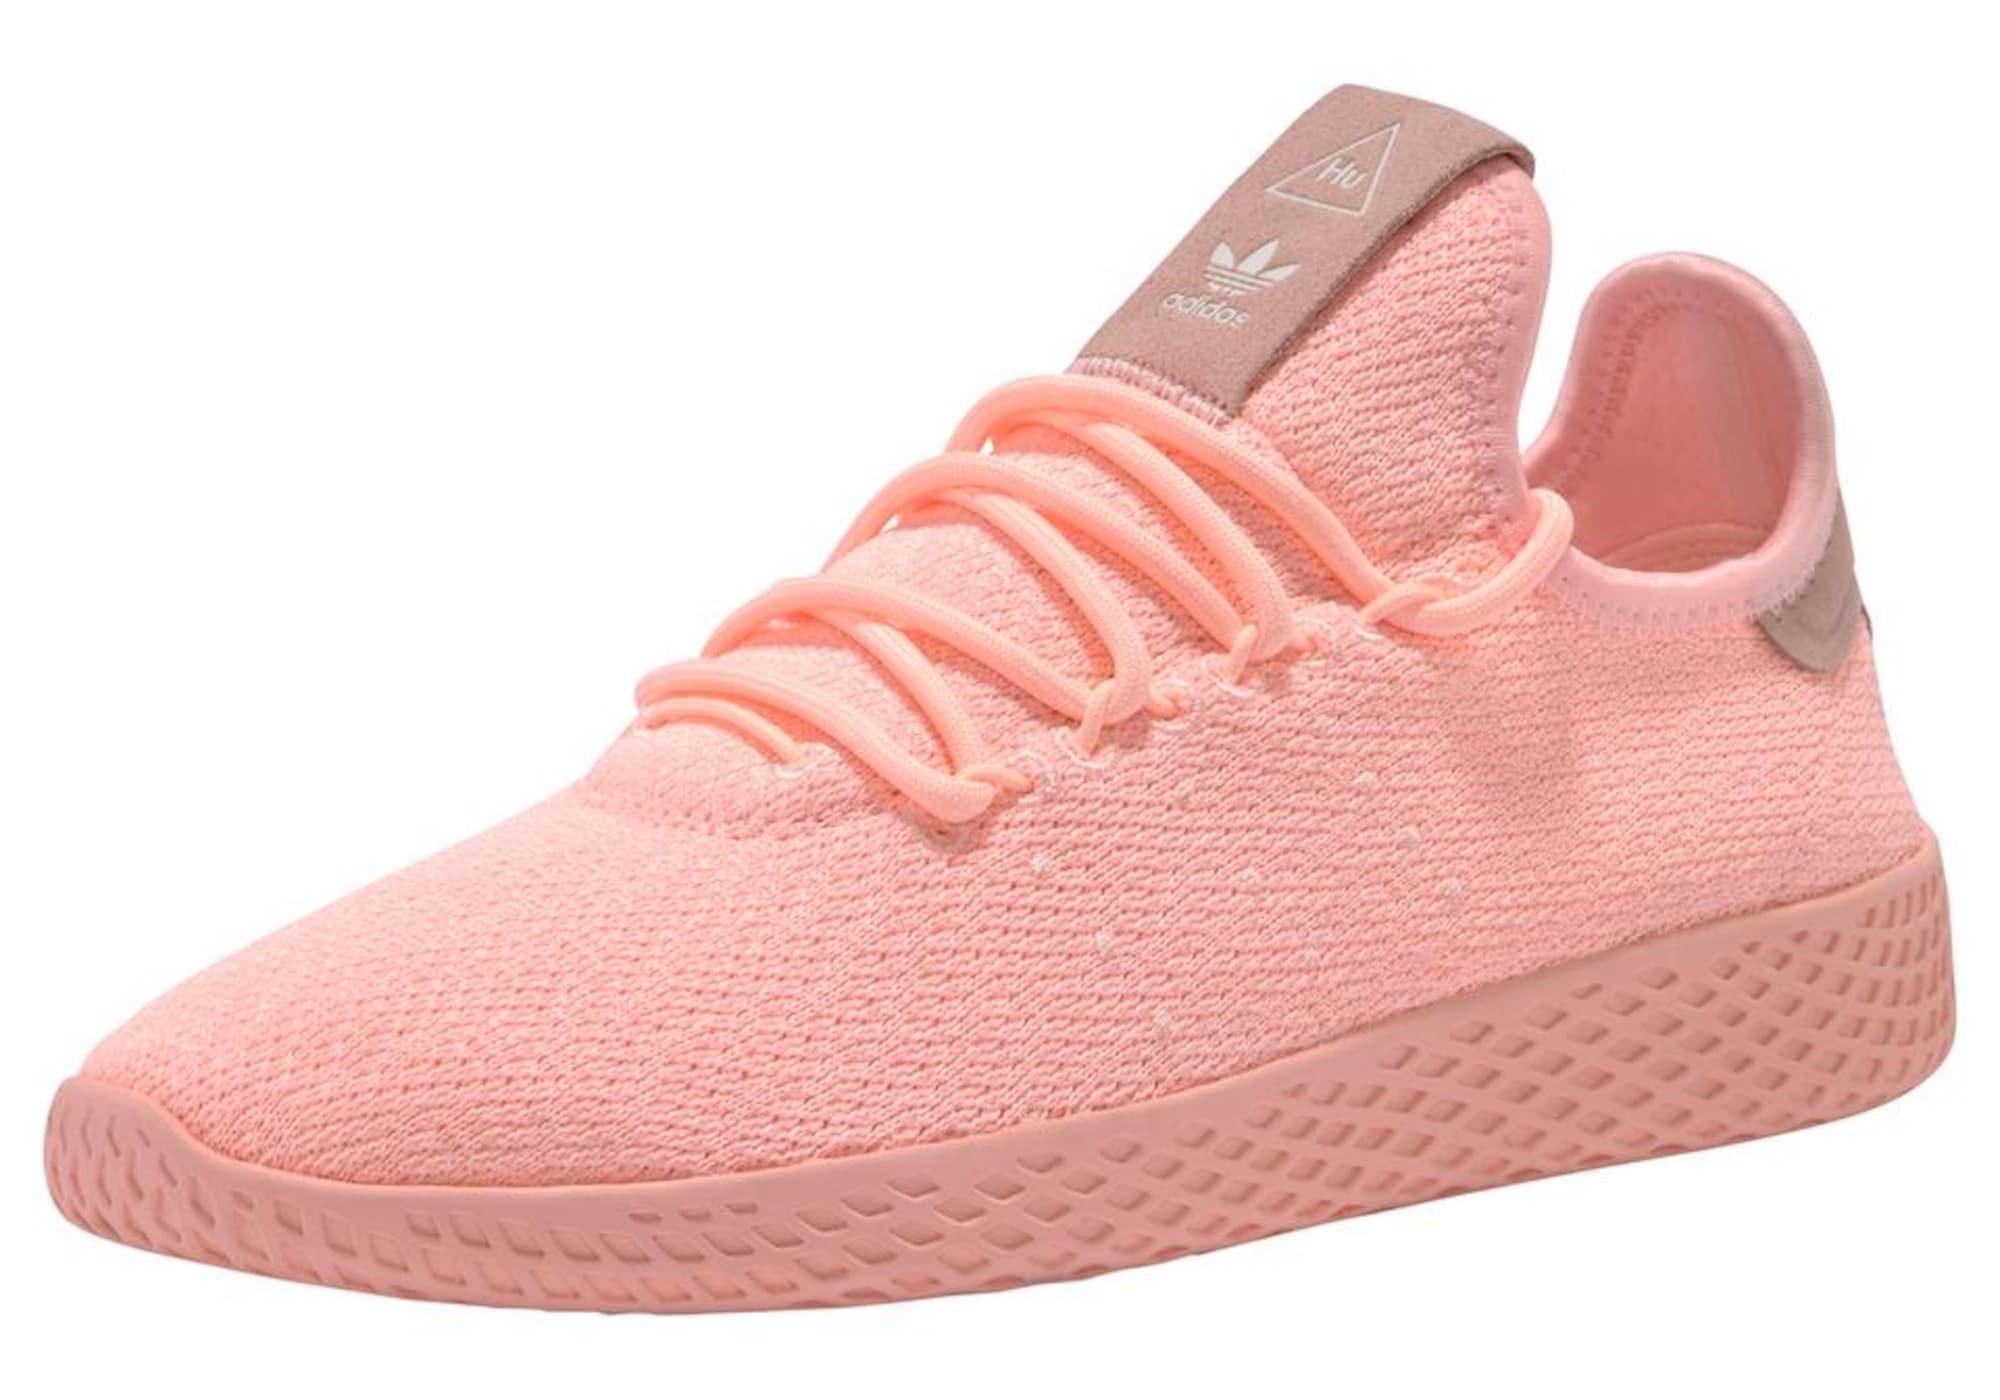 ADIDAS ORIGINALS, Dames Sneakers laag 'Pharrell Williams Tennis Hu', koraal